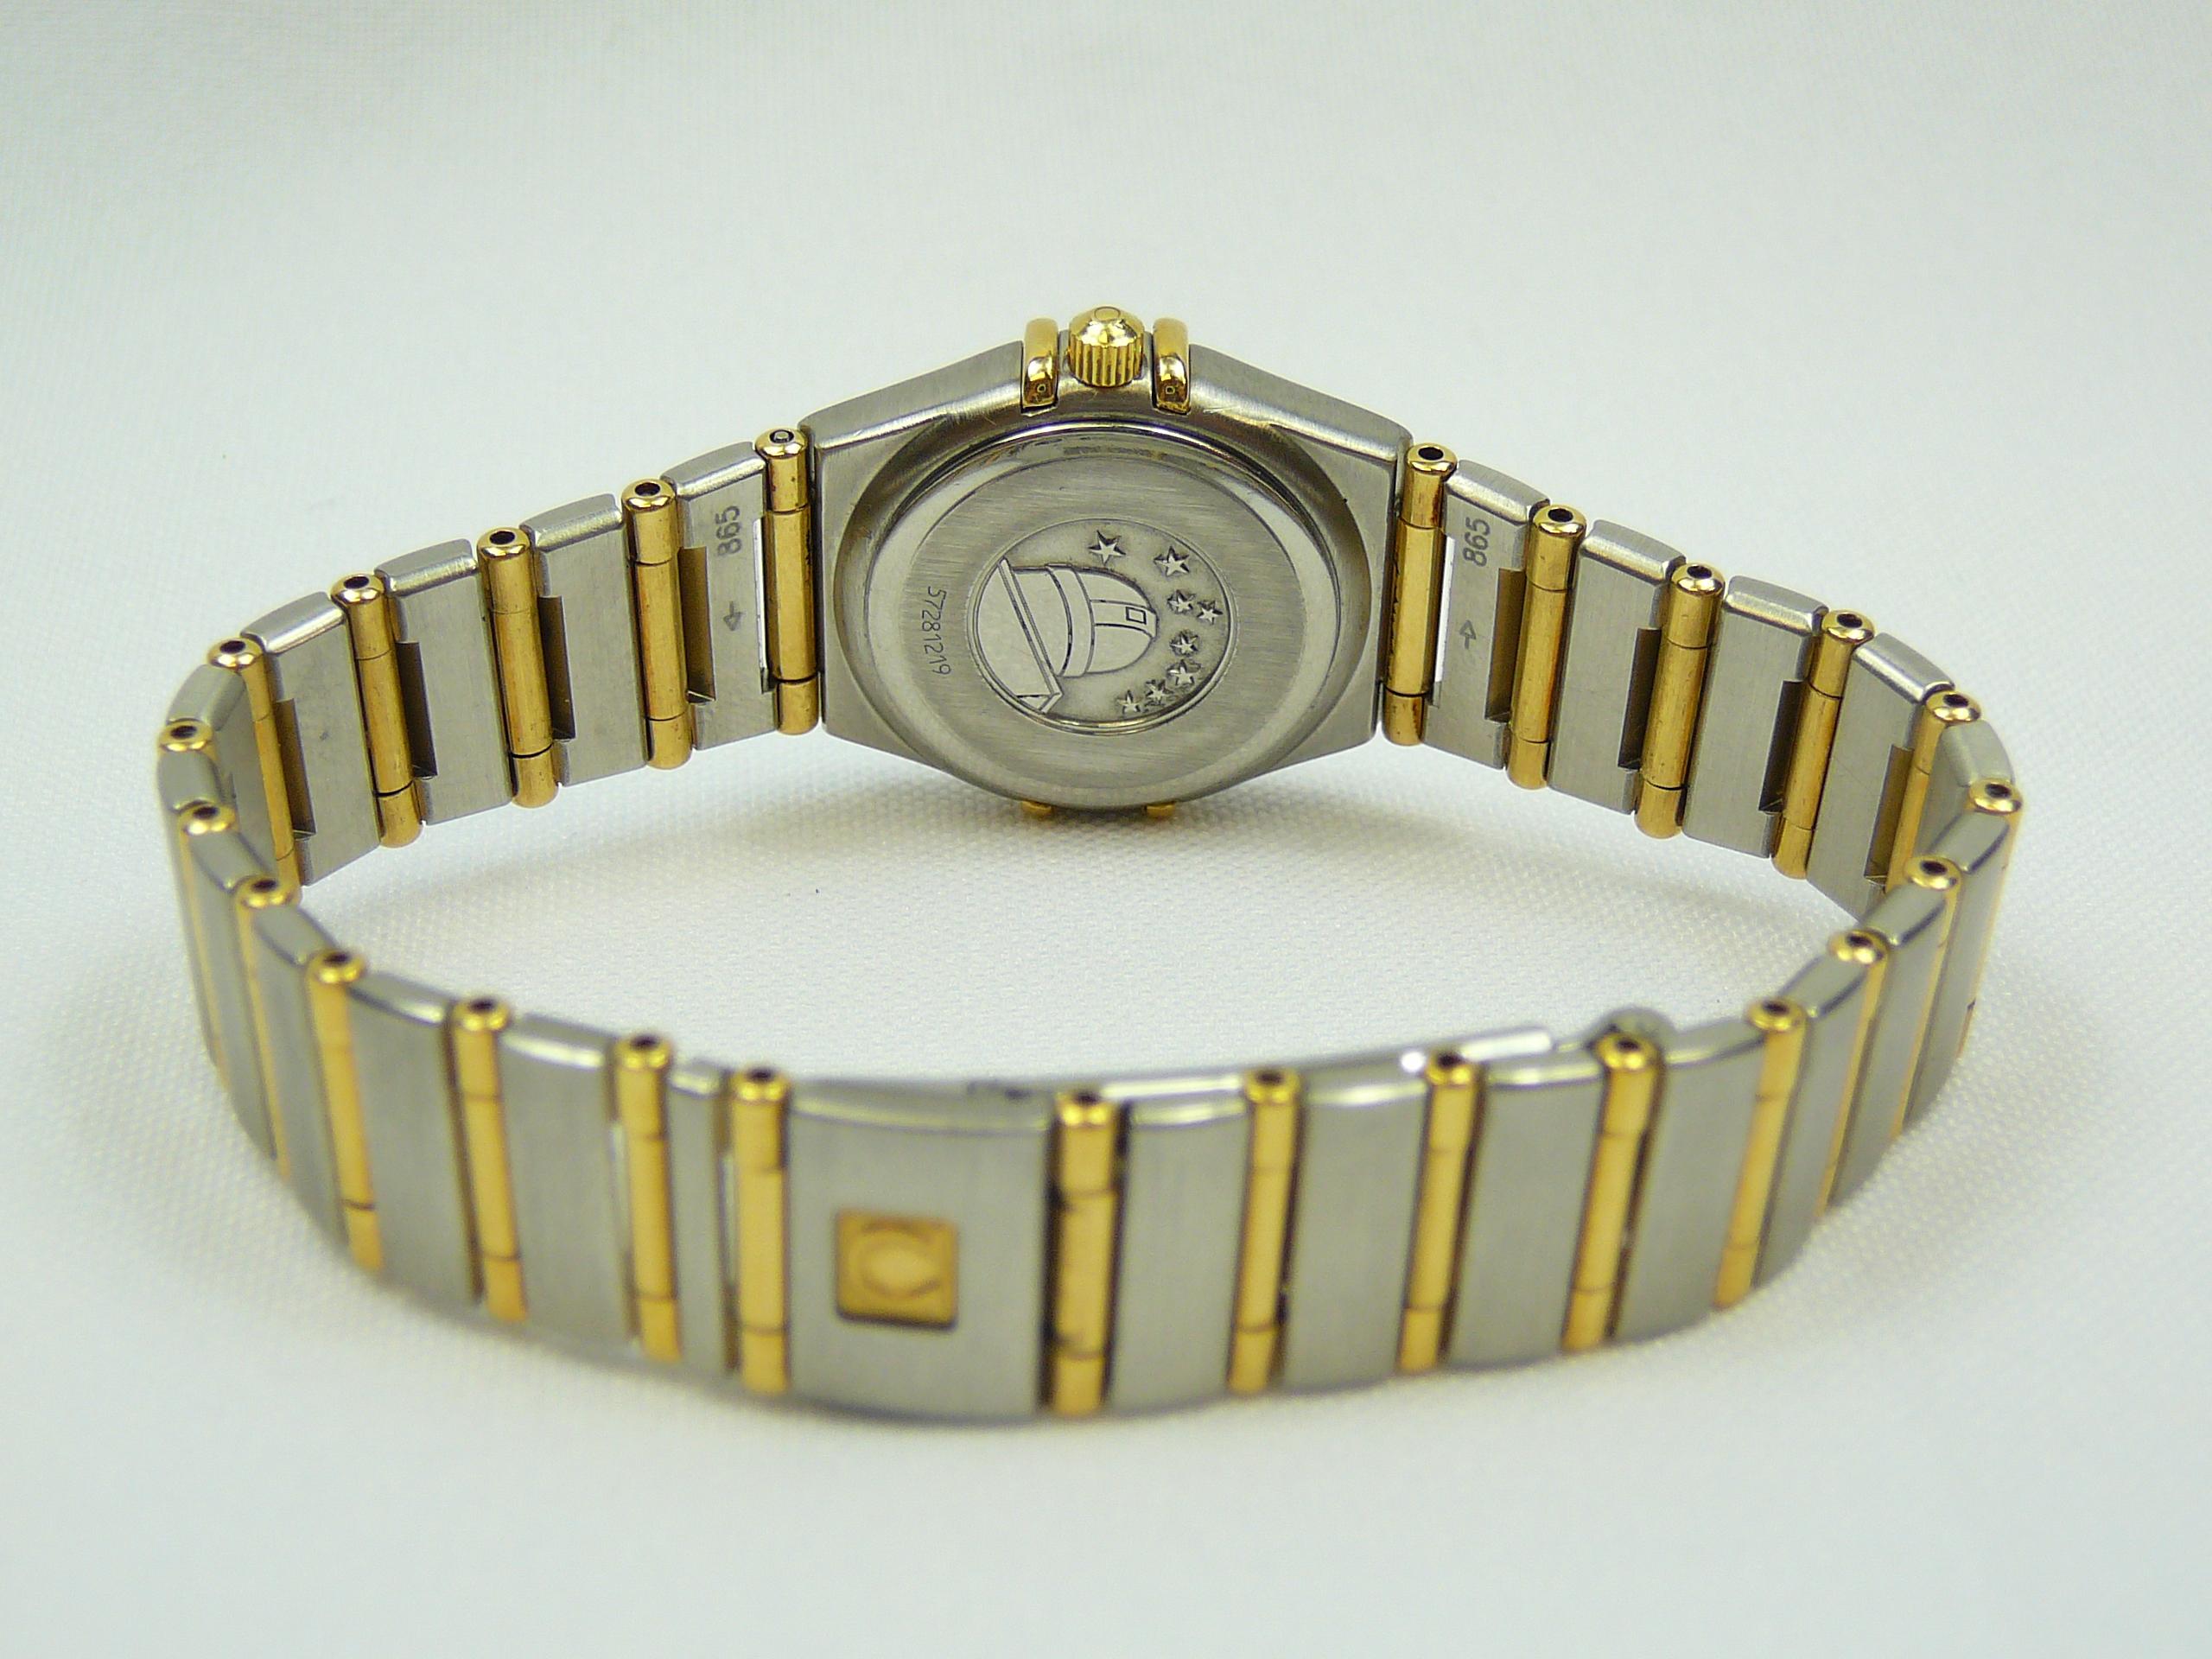 Ladies Omega Wrist Watch - Image 3 of 3